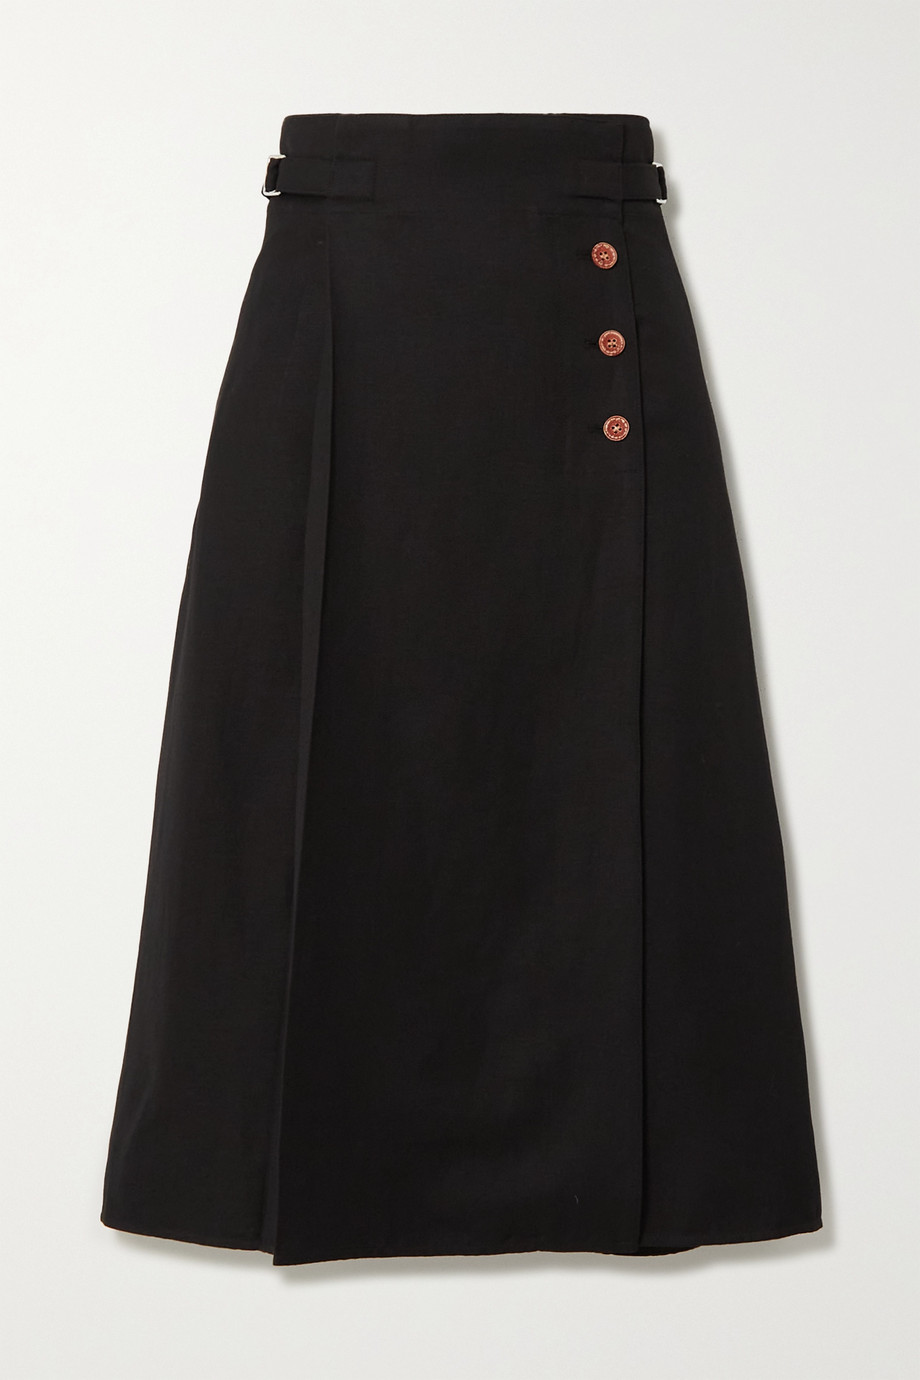 Acne Studios Wool and hemp-blend twill midi skirt